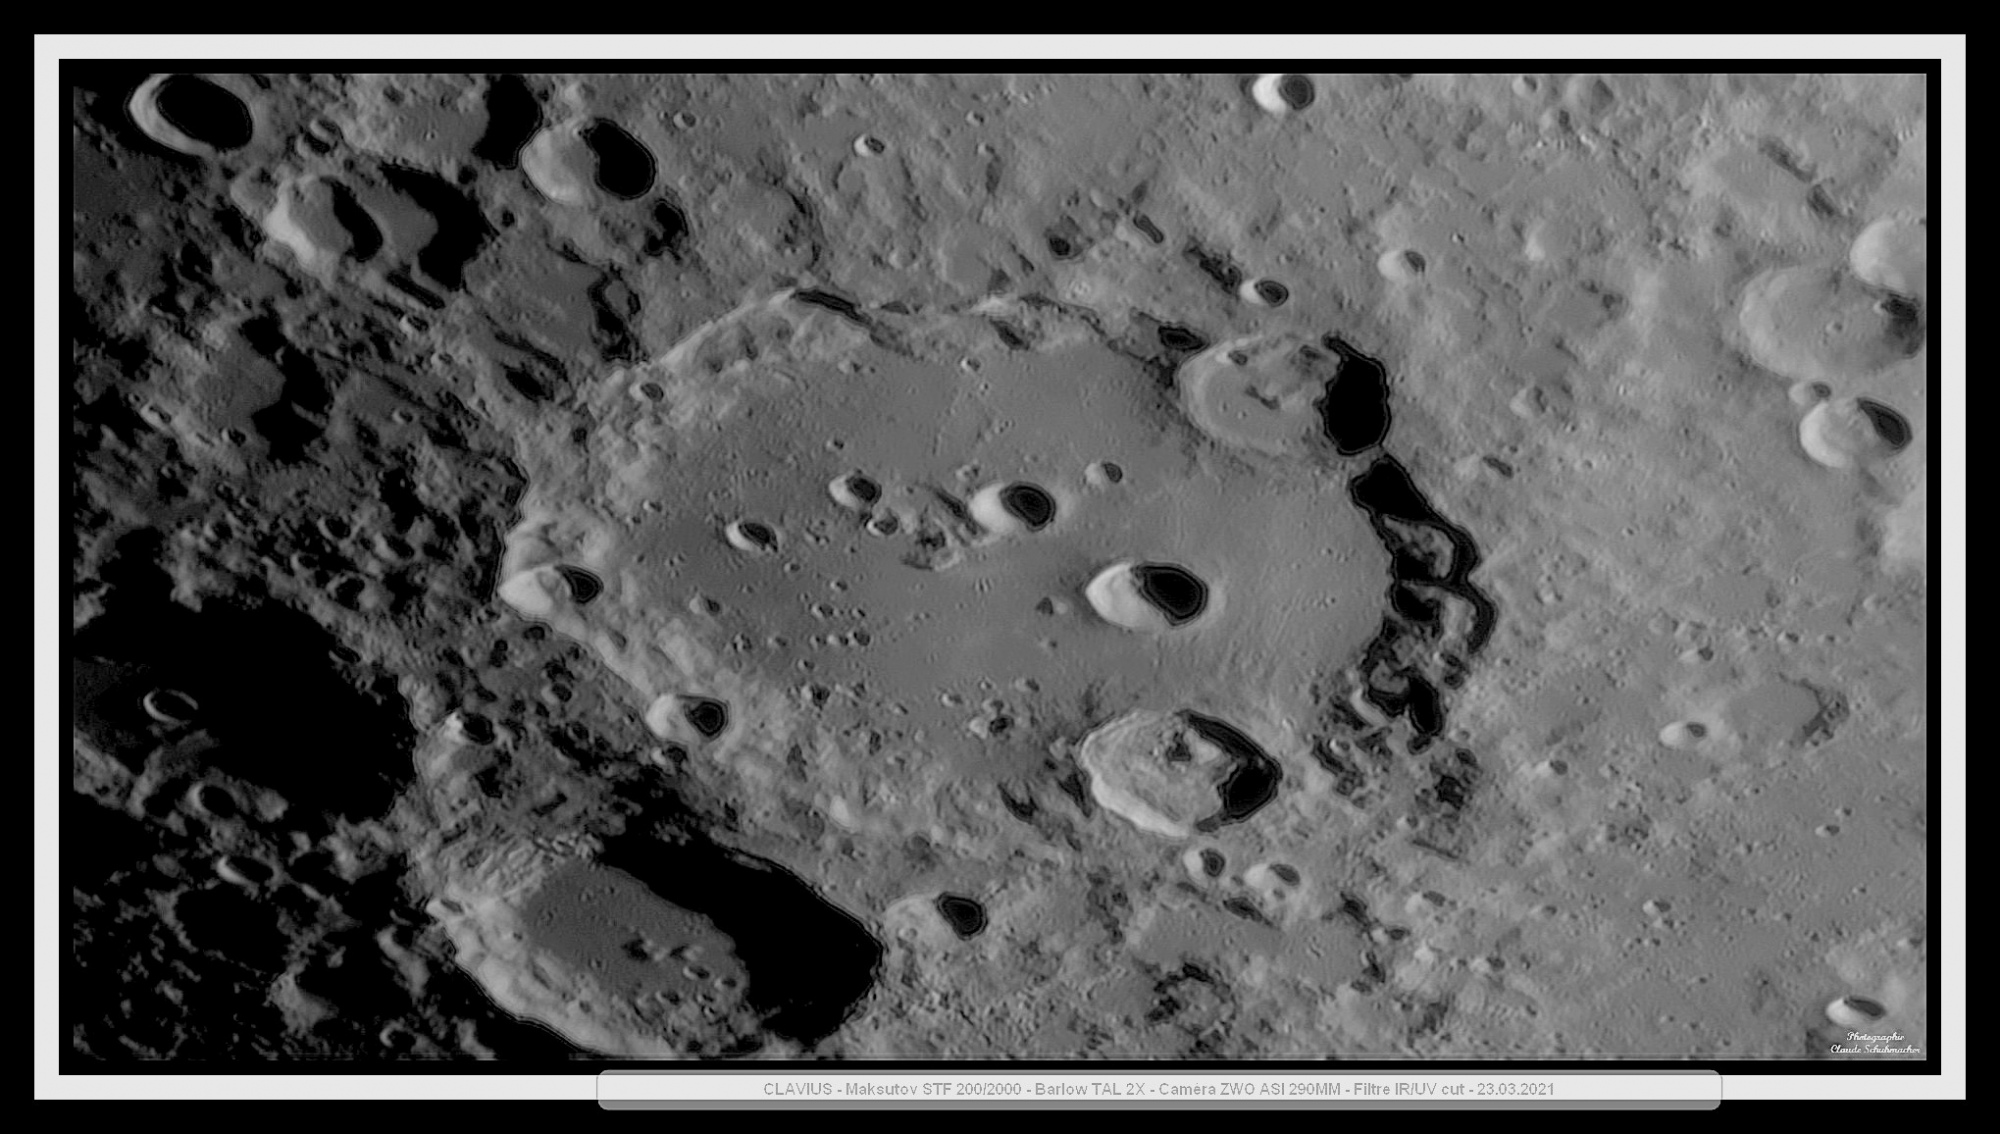 607751e534af8_2021-03-23-CLAVIUS(1)bis.thumb.jpg.cc624a091b7700e58e8df2dea29d1914.jpg